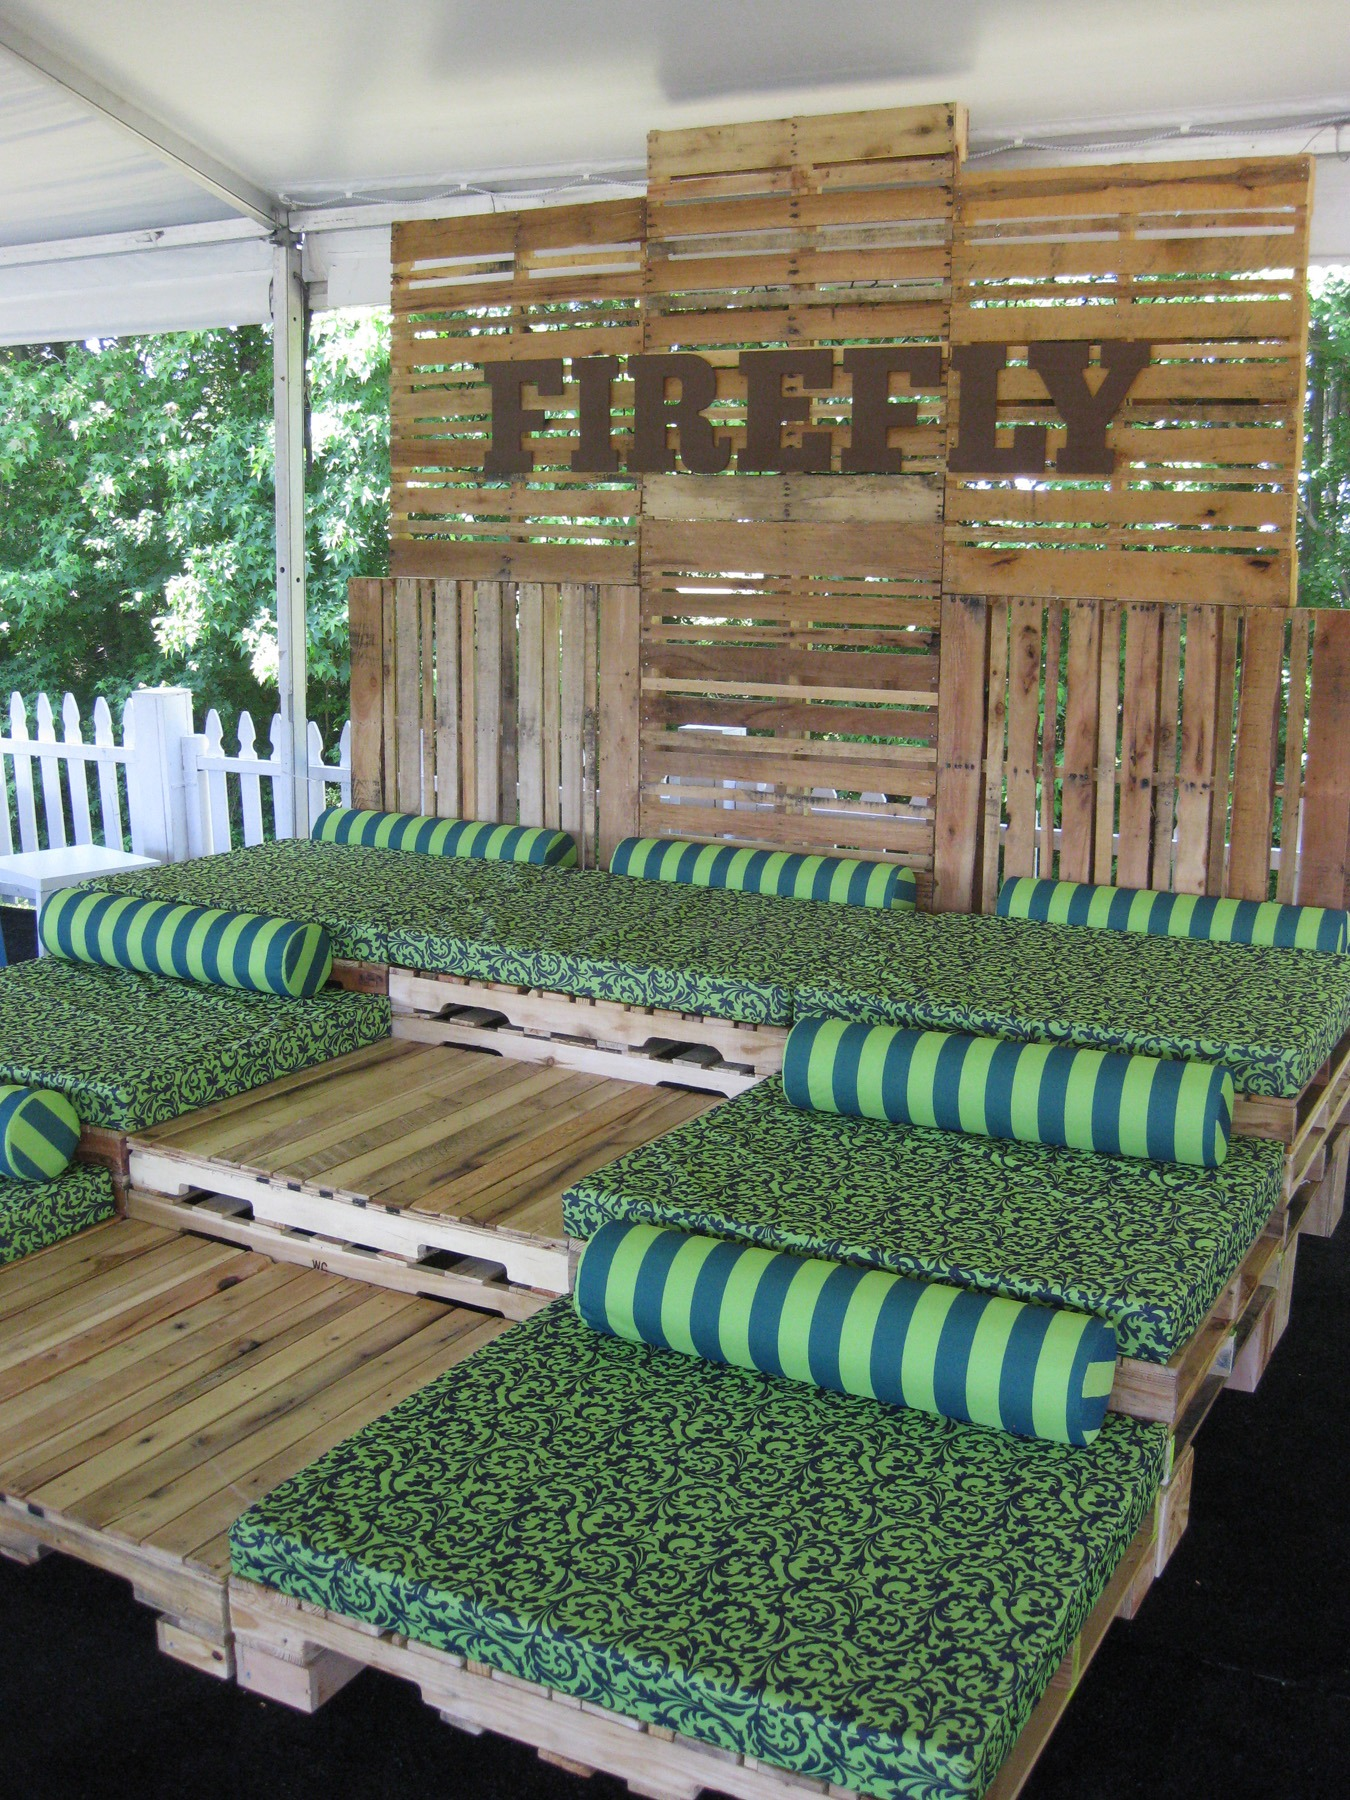 Firefly pallet seating on vip loft ivan carlson